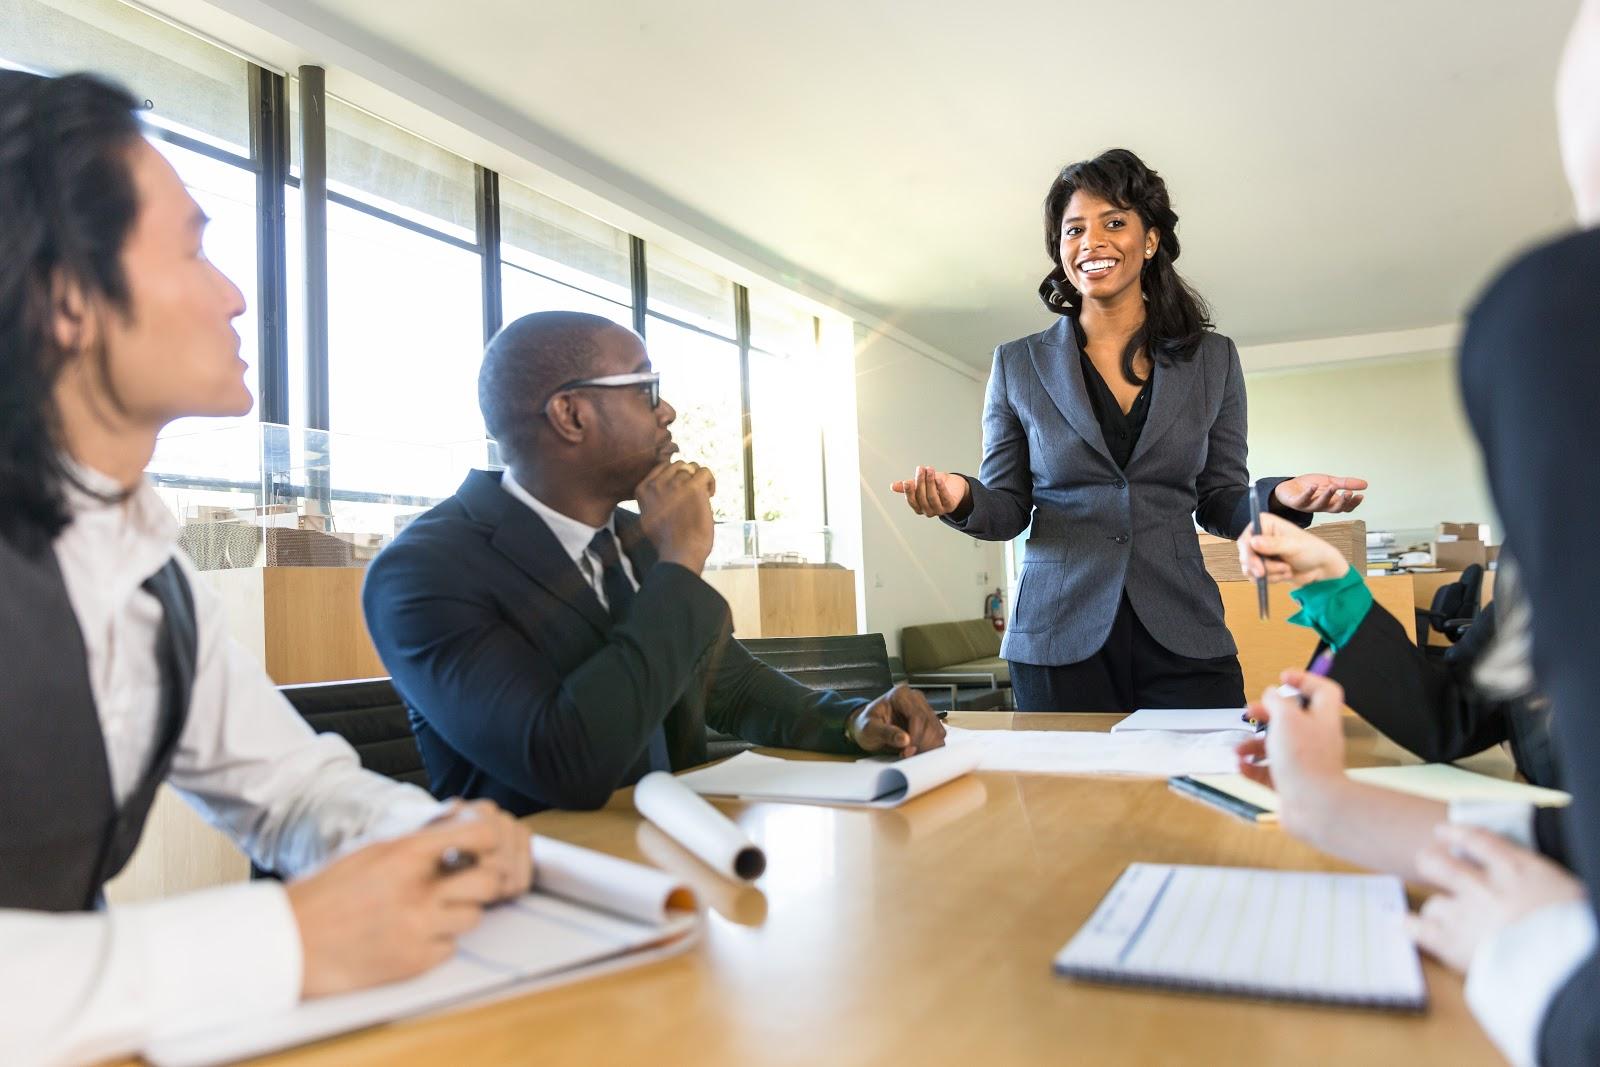 Employee retention strategies: CEO speaks to her team